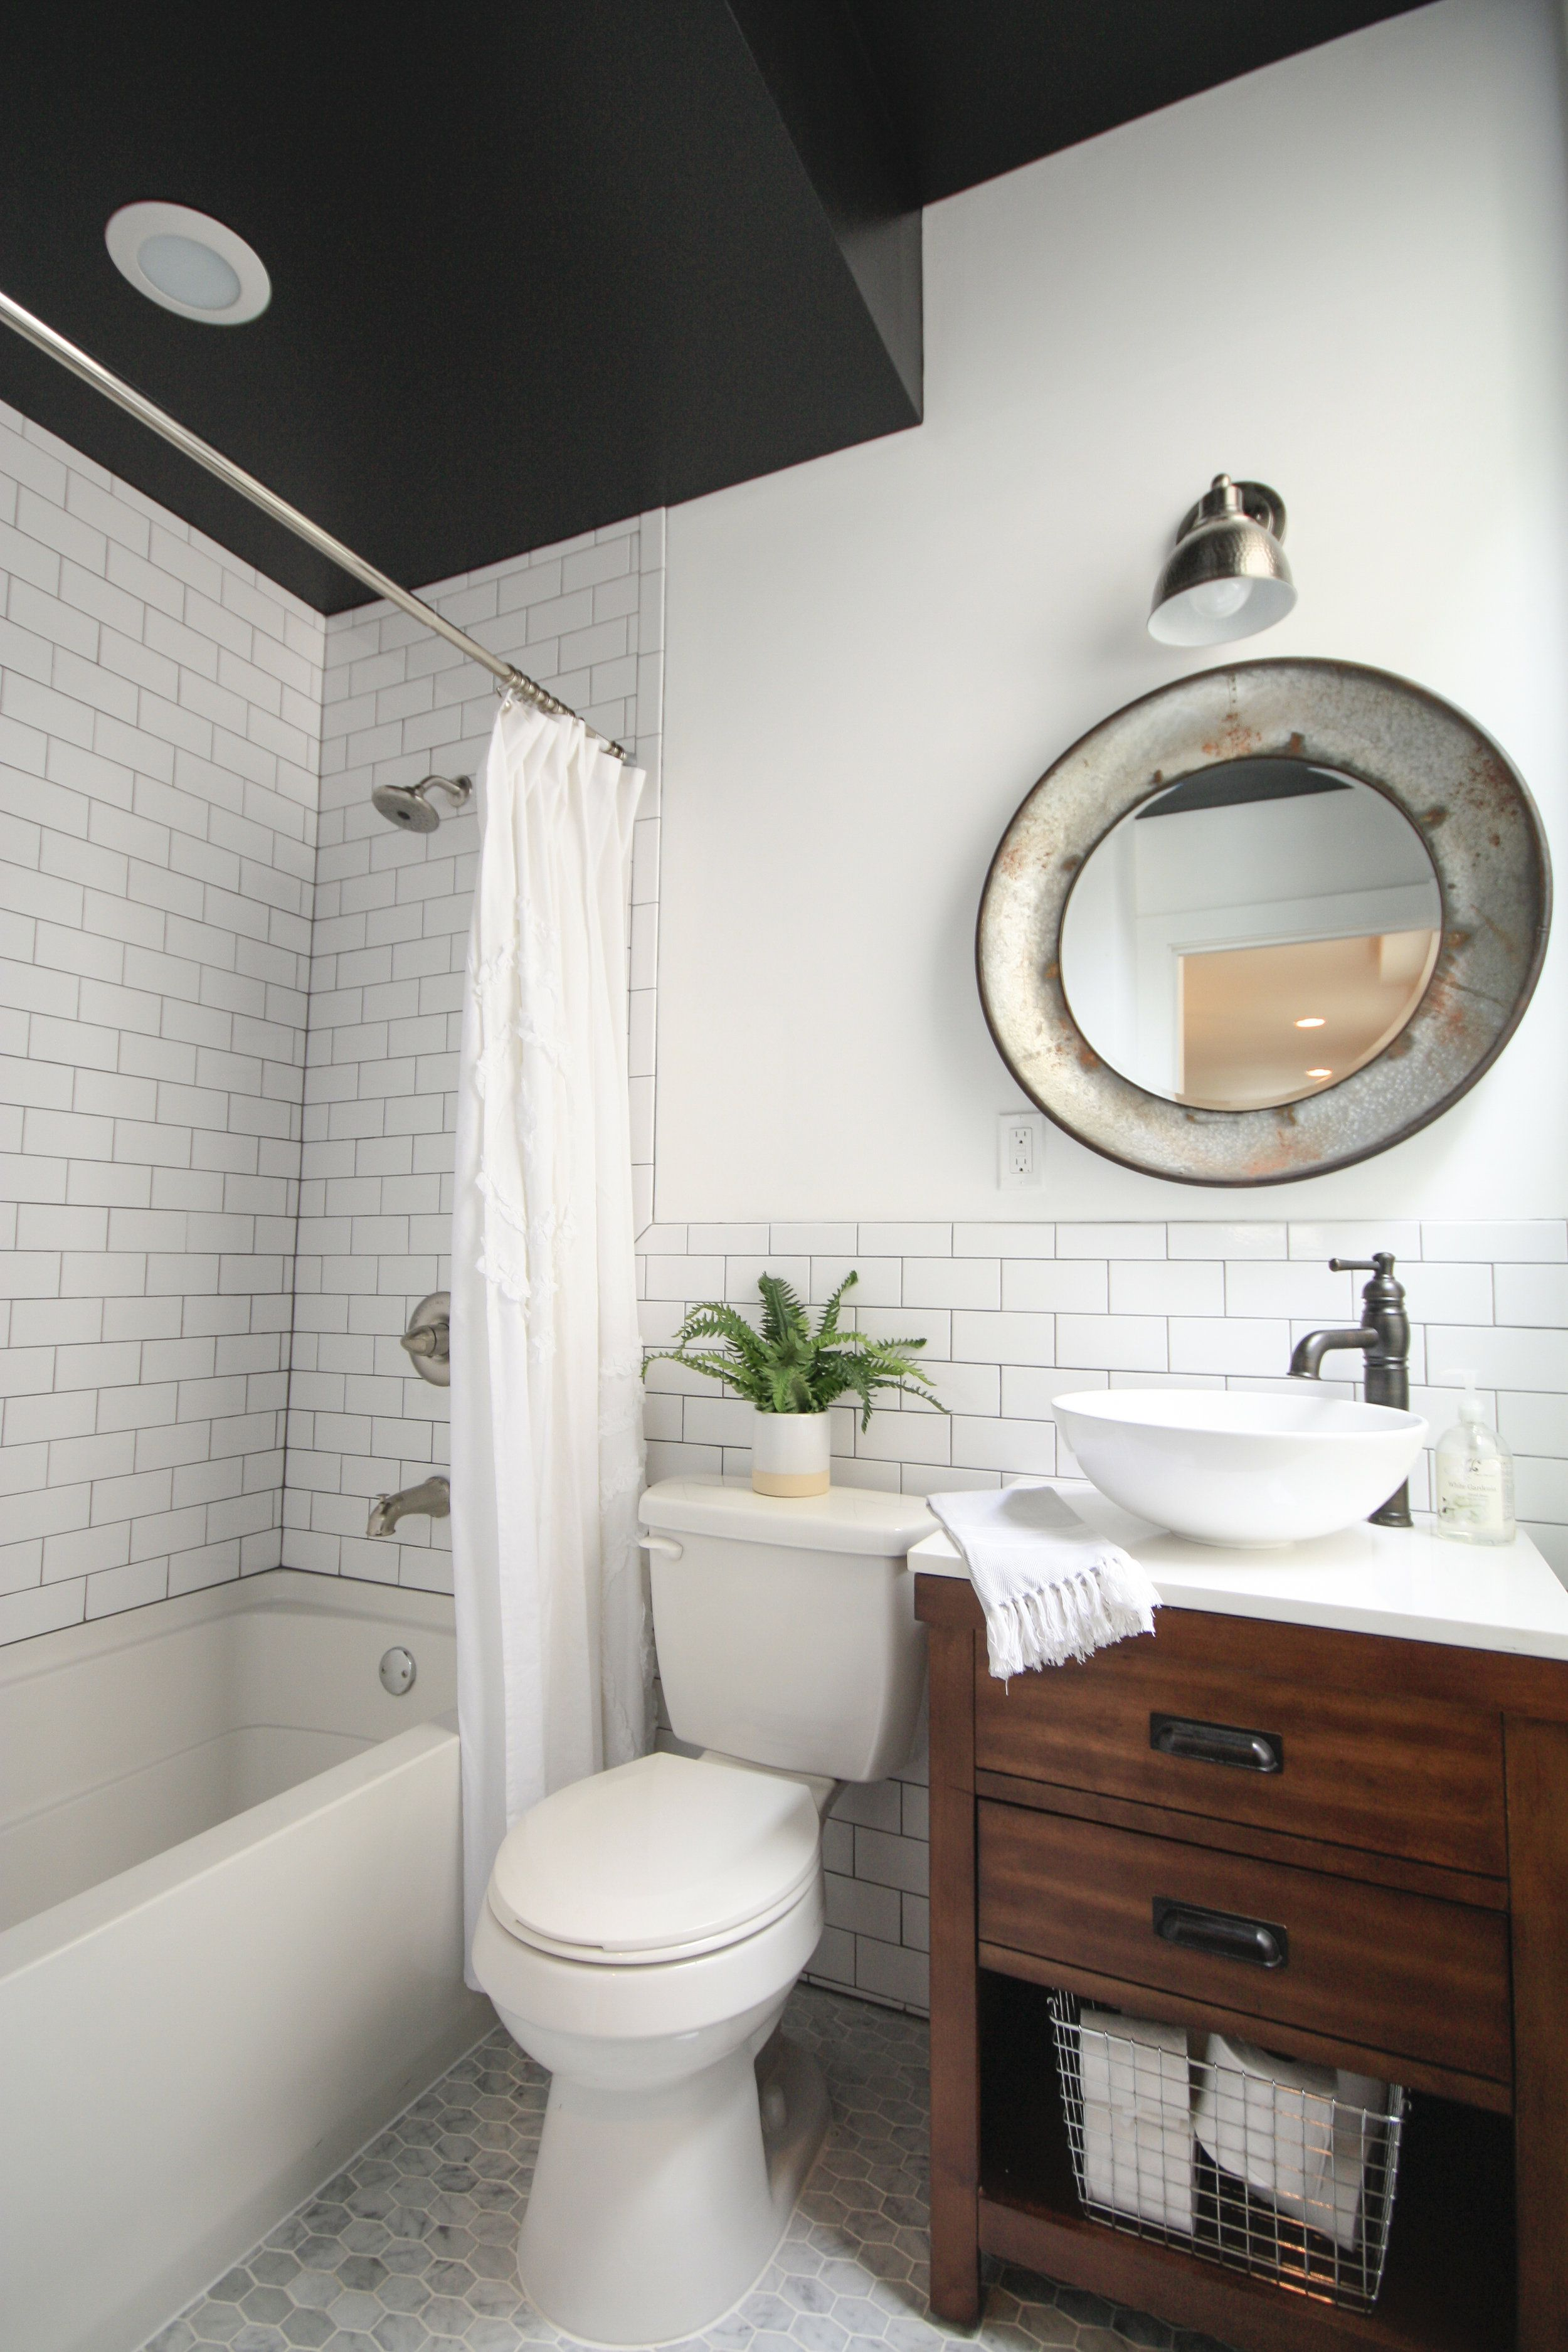 10 Ways To Use Subway Tile That Aren T Boring Af Flippinwendy Design Mold On Bathroom Ceiling Subway Tiles Bathroom White Bathroom Tiles